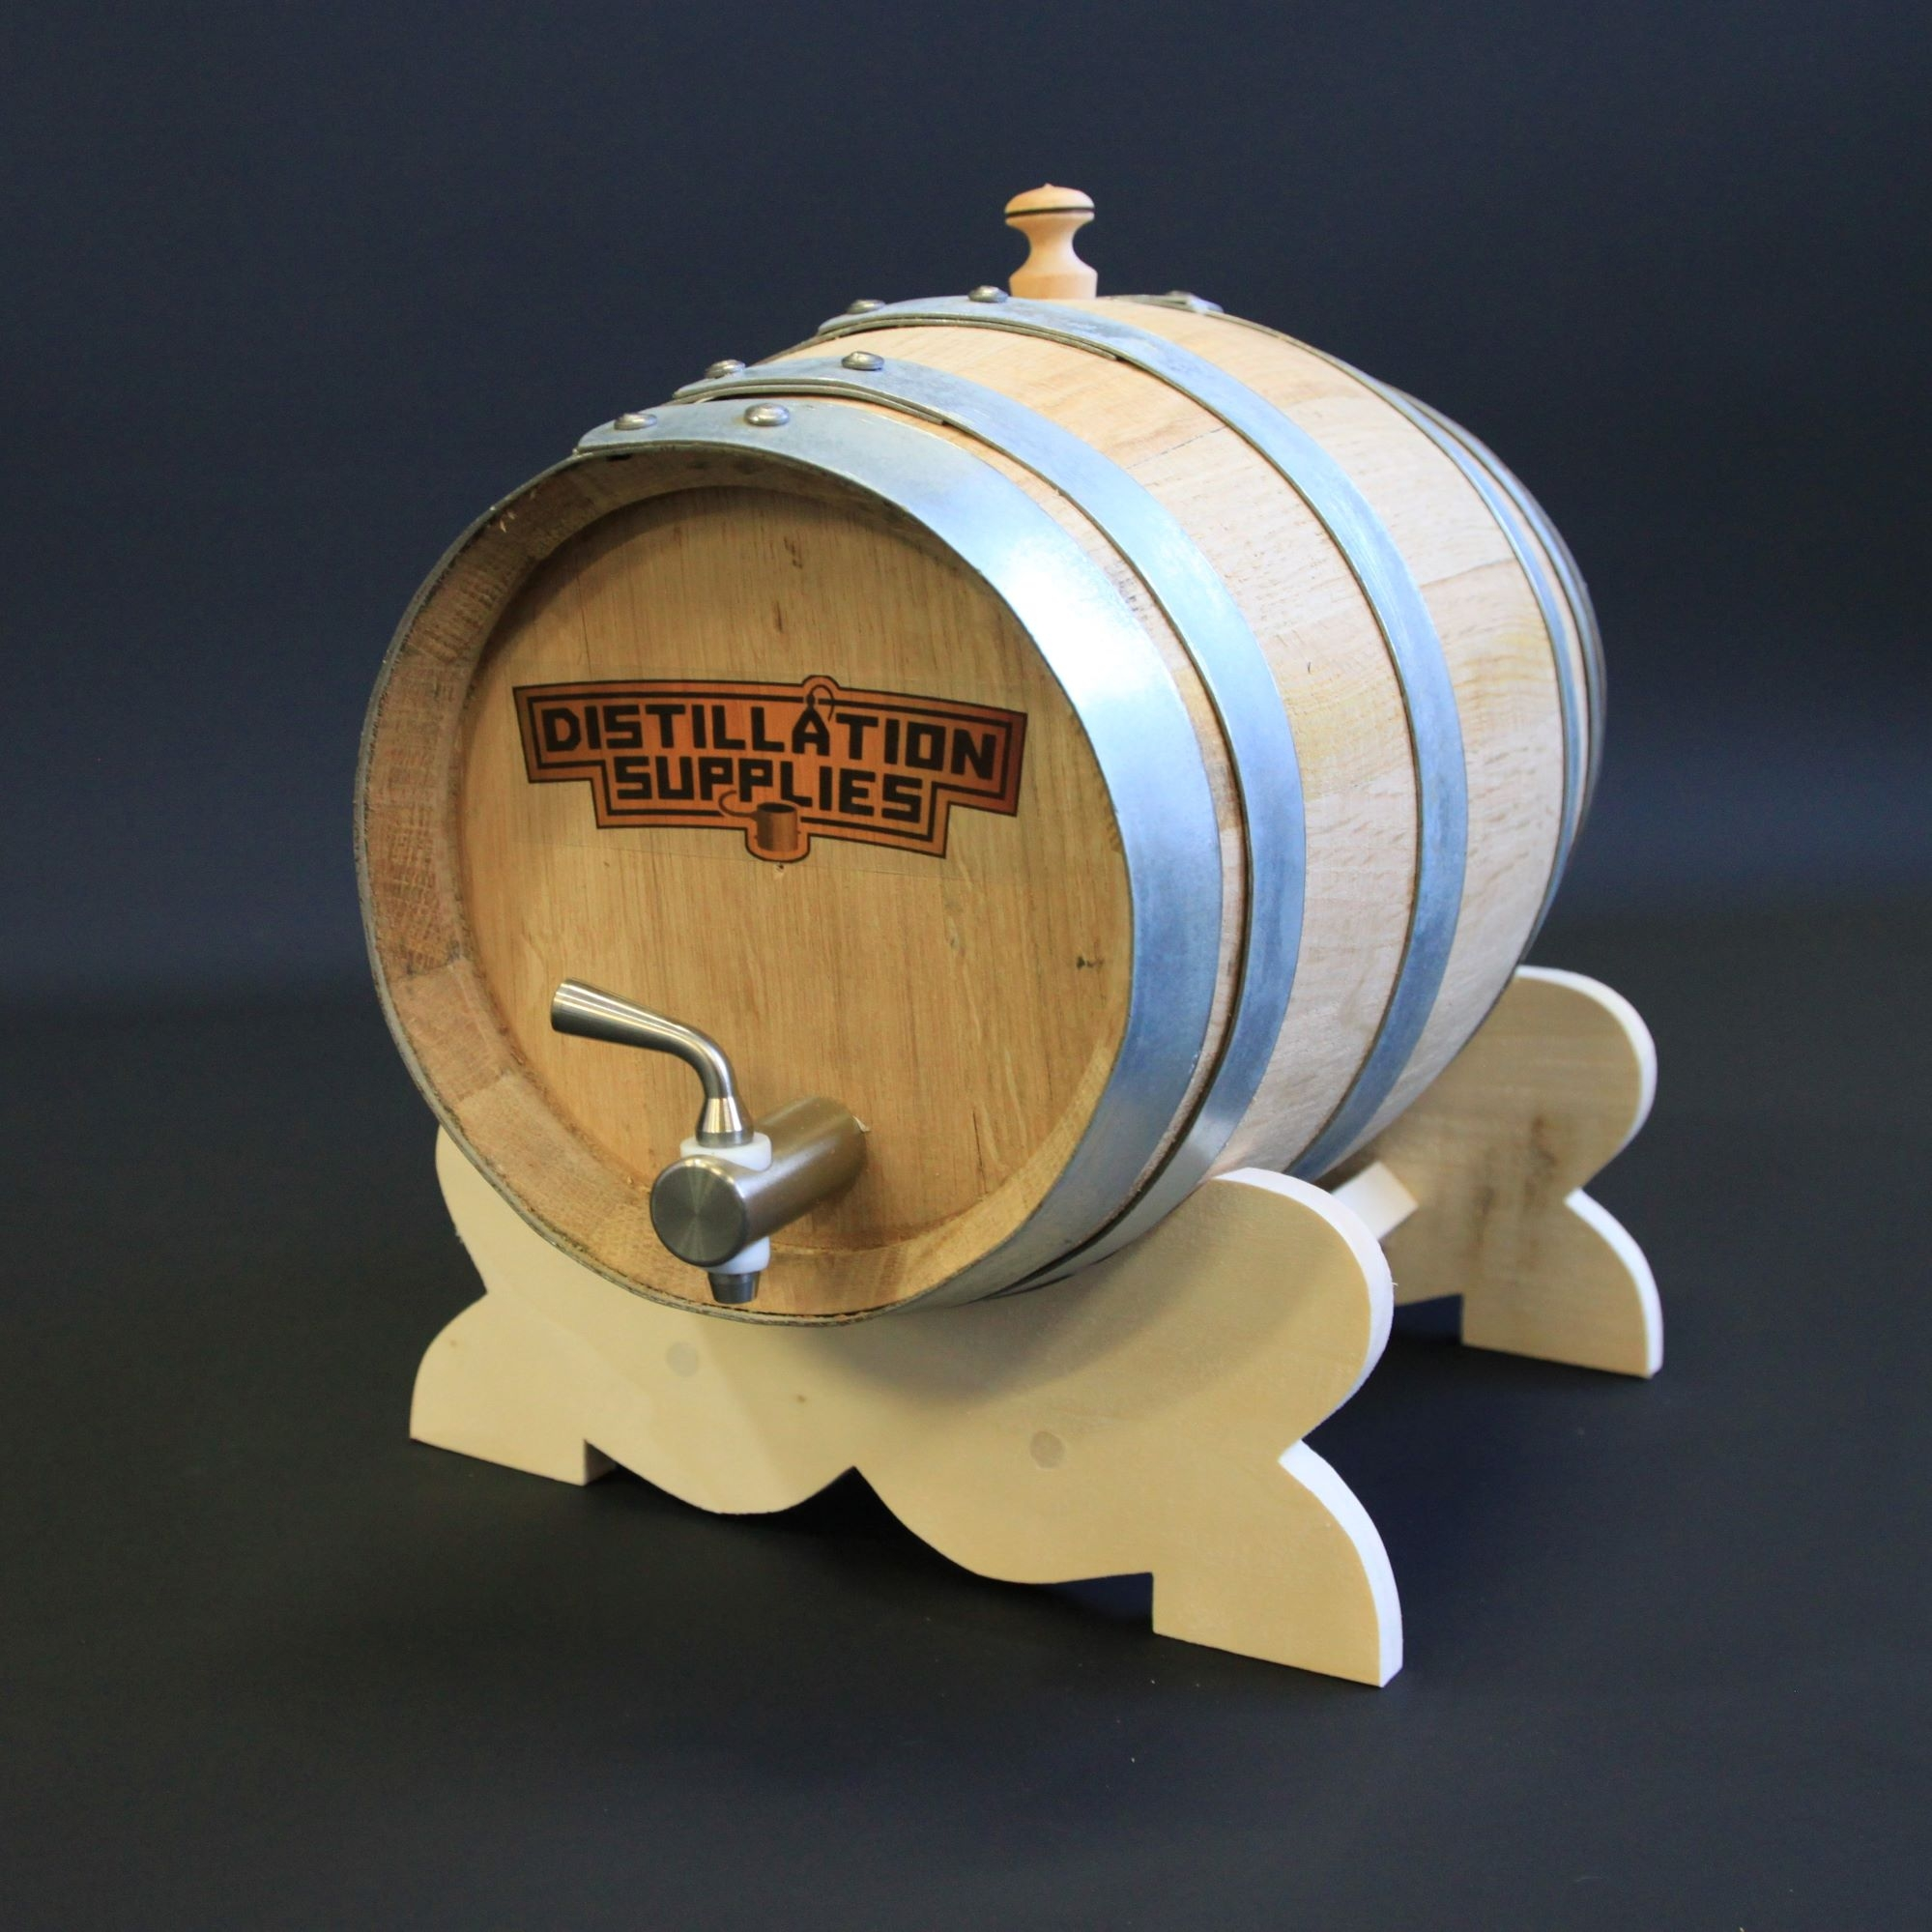 Oak woorden barrel | Distillation Supplies